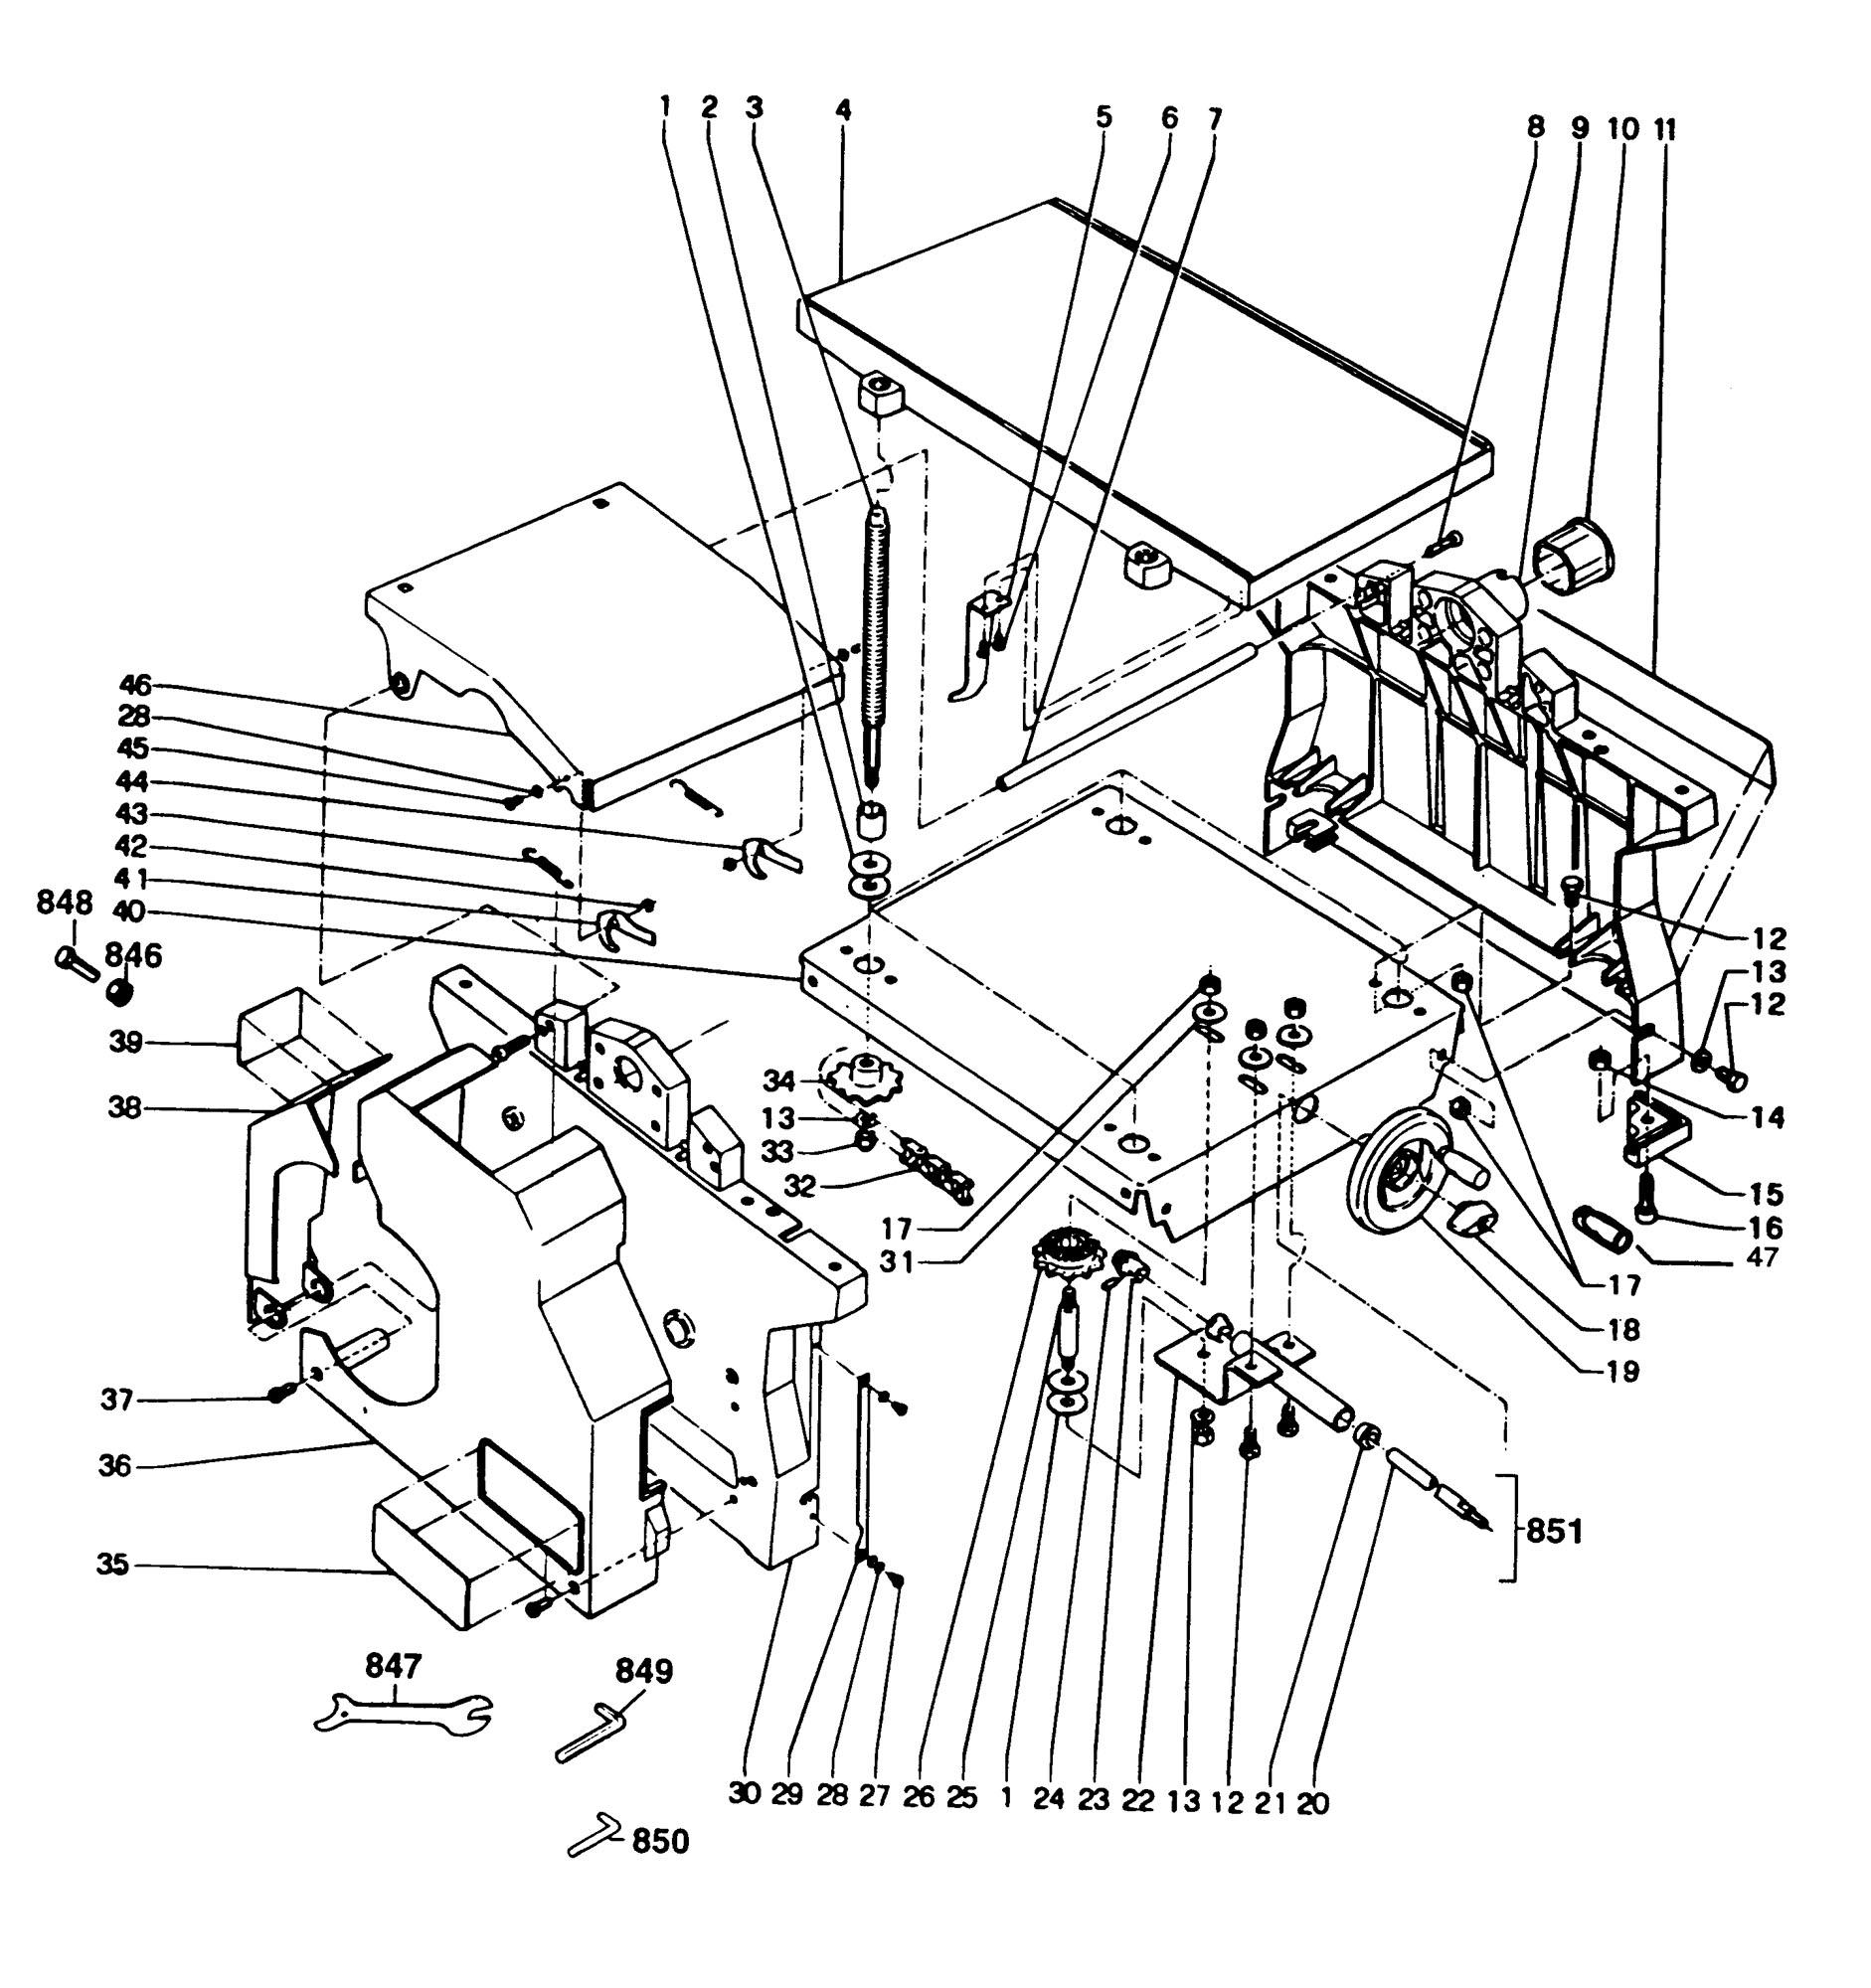 hight resolution of spares for dewalt dw1150 f planer thicknesser type 1 dewalt planer wiring diagram